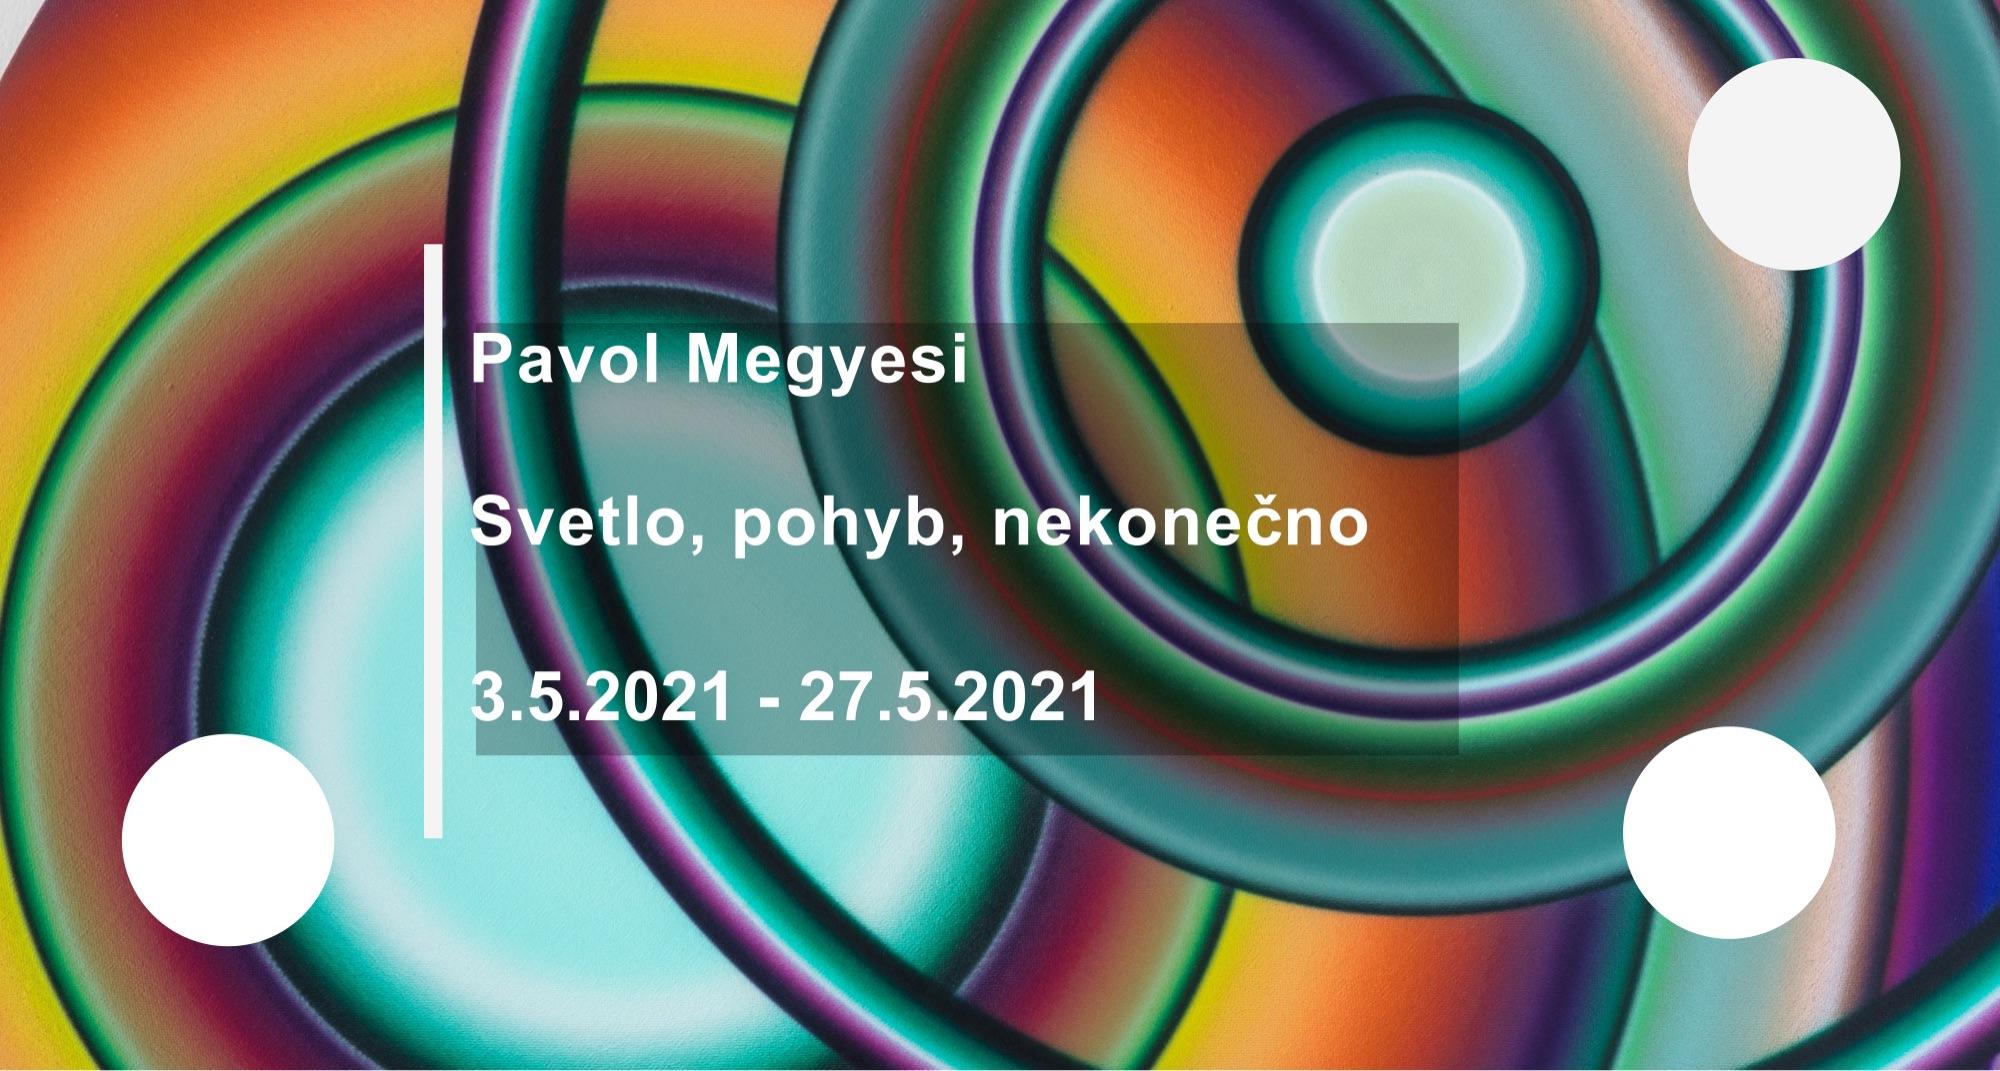 Pavol Megyesi